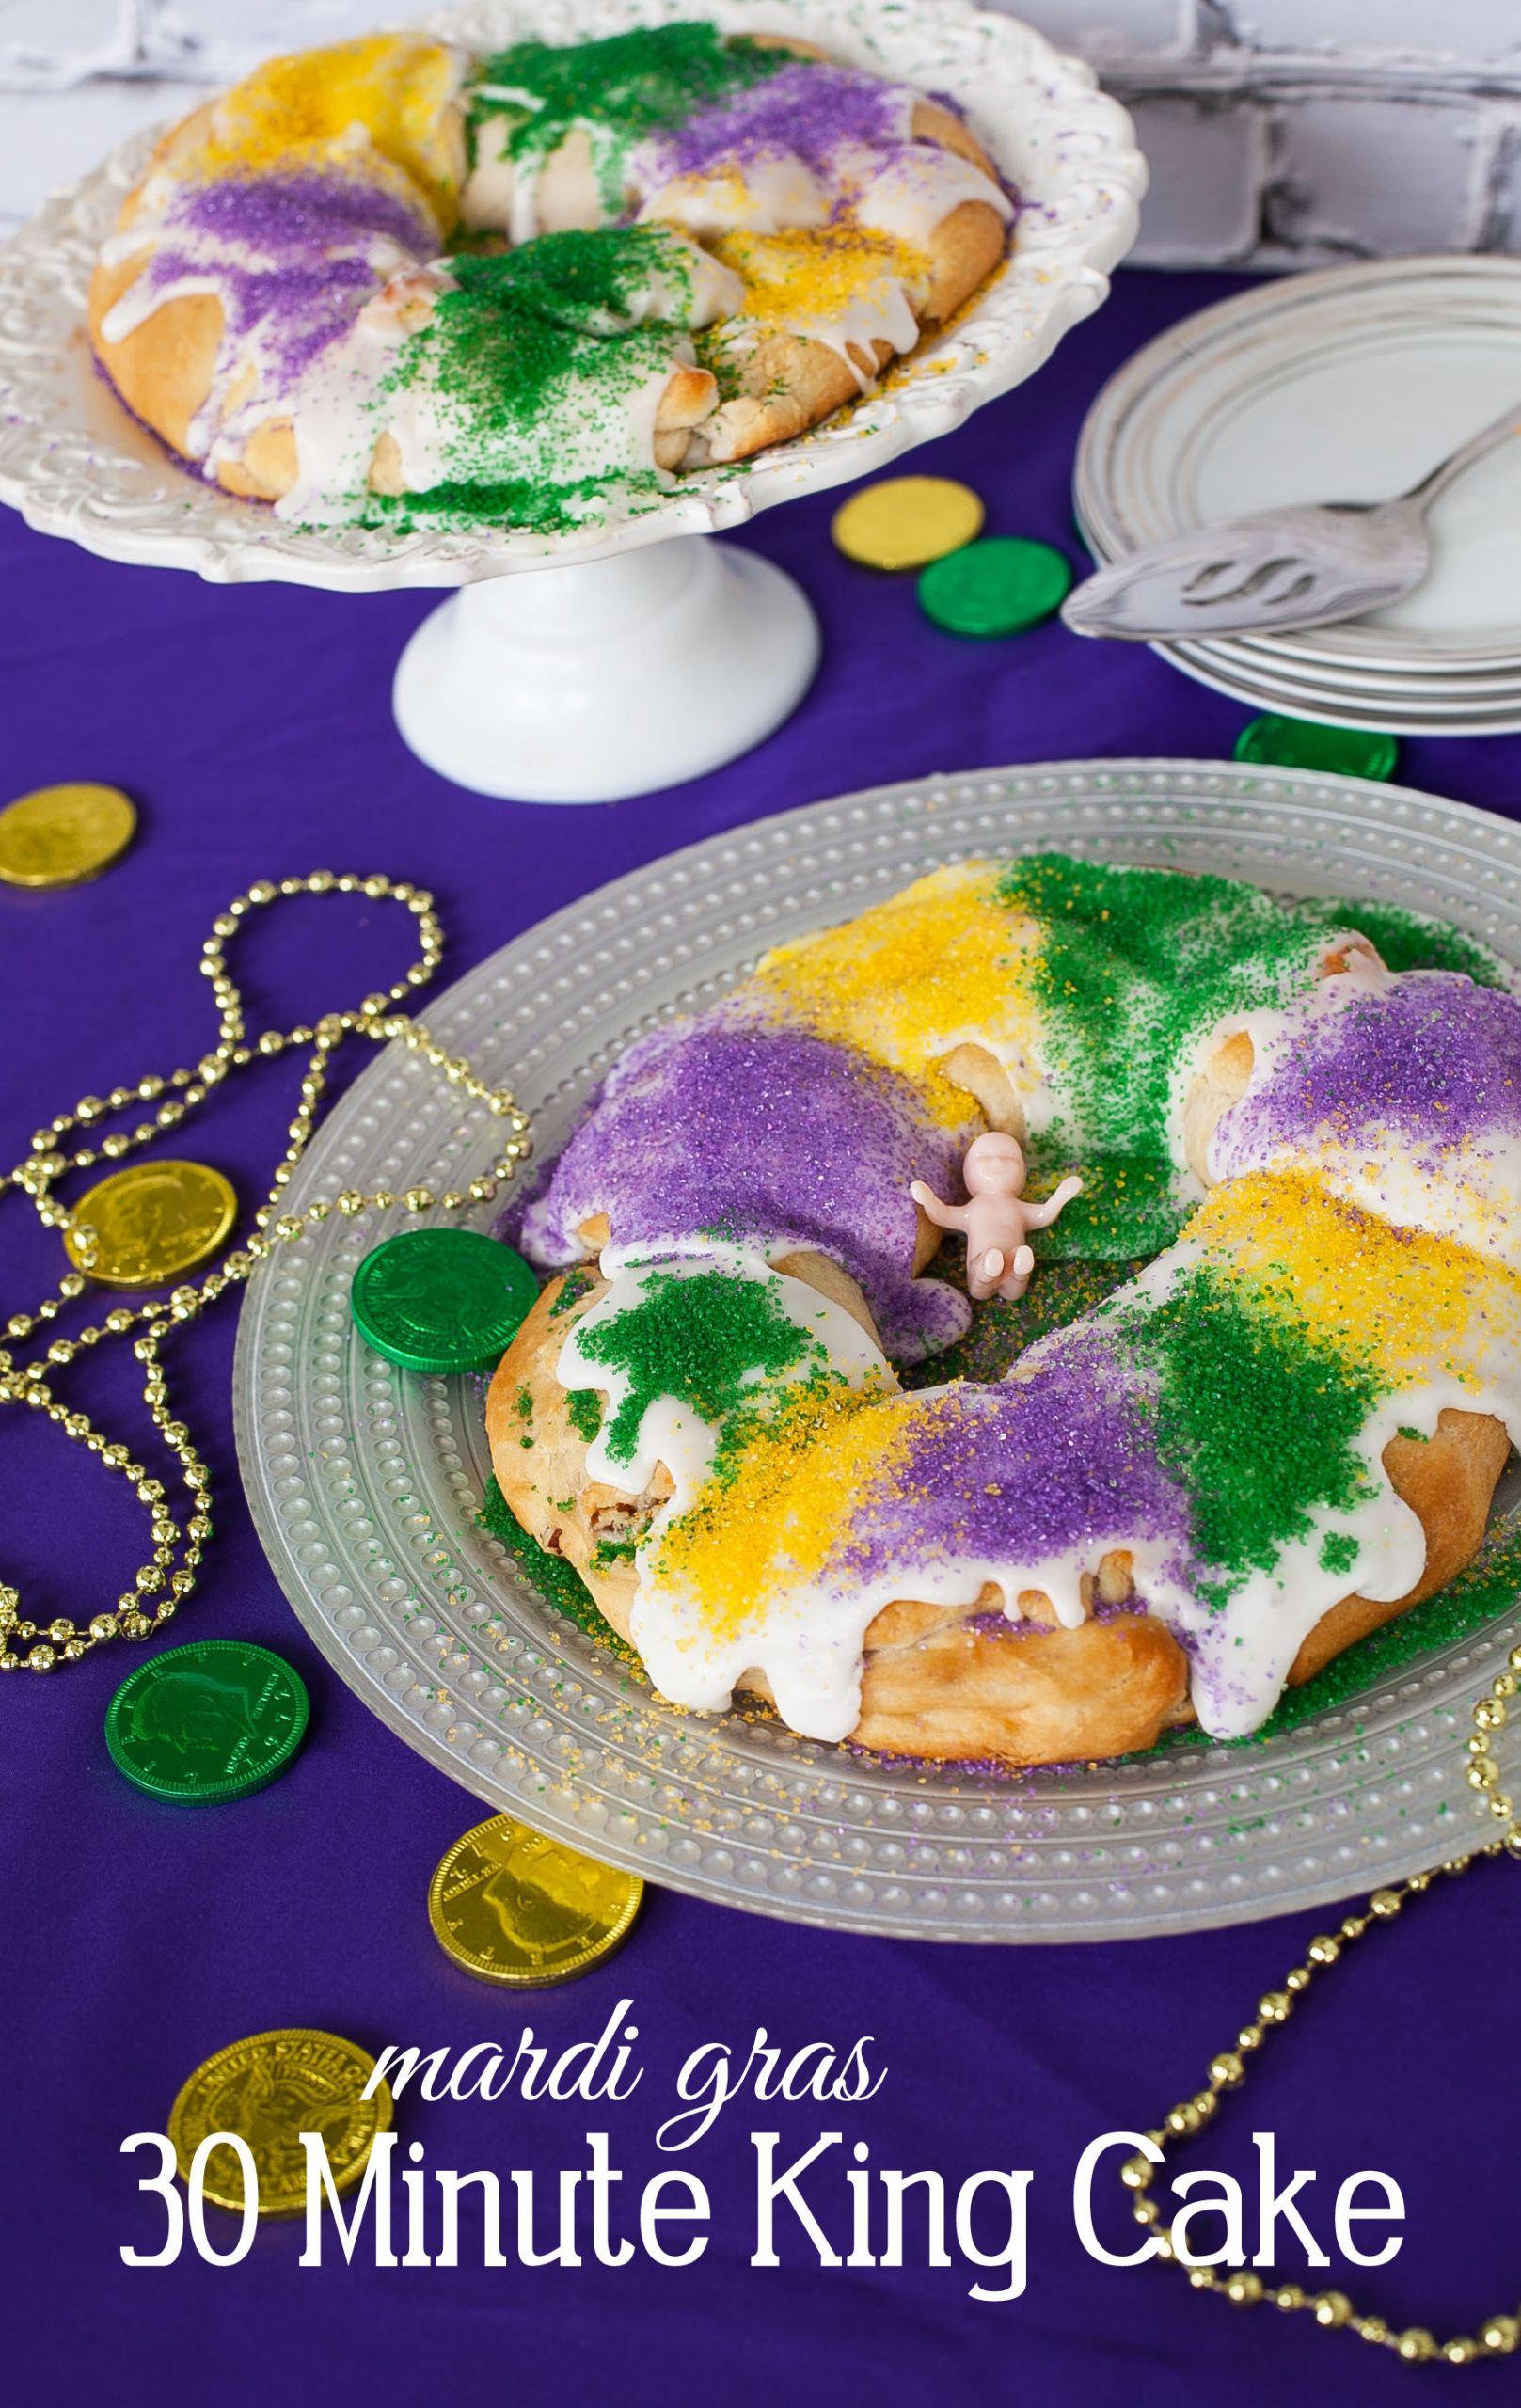 Mardi Gras King Cake Recipe  Easy 30 Minute King Cake Recipe for Mardi Gras Frog